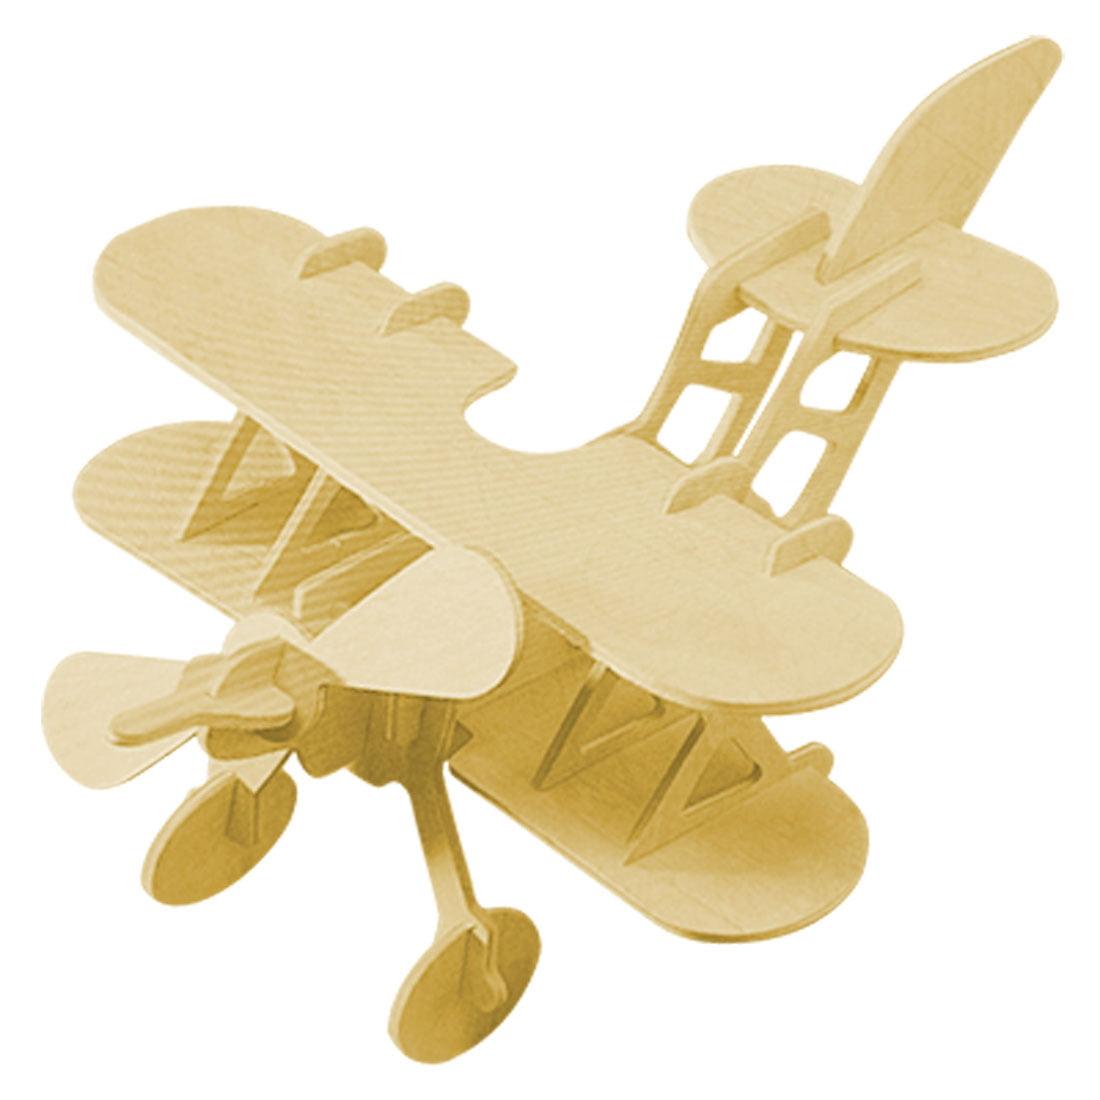 3D Wooden Bi-plane Model Construction Kit DIY Puzzle Toy Gift